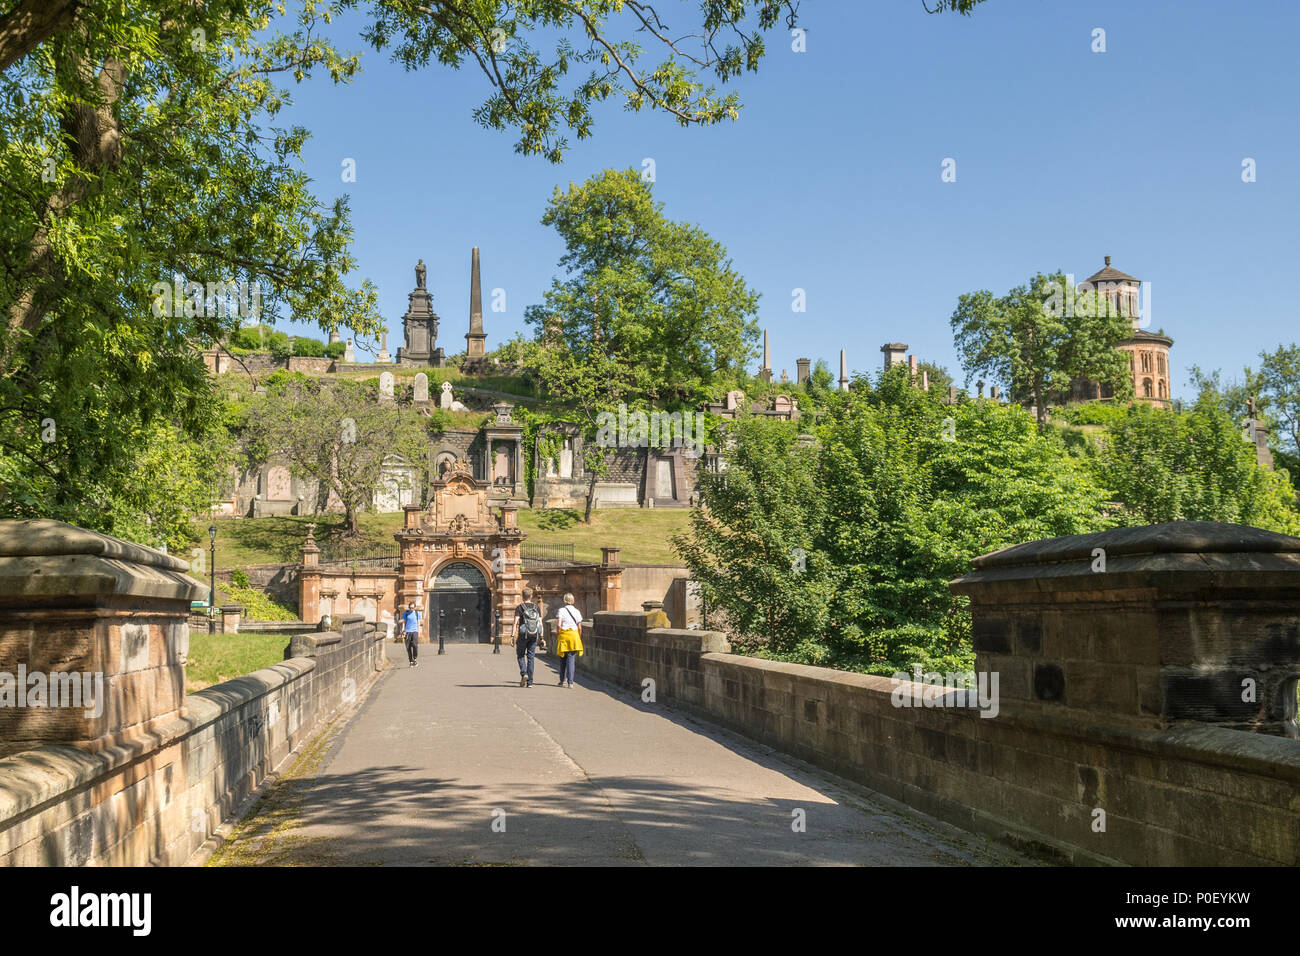 people walking over the Bridge of Sighs entering Glasgow Necropolis, victorian cemetery, Glasgow, Scotland, UK Stock Photo